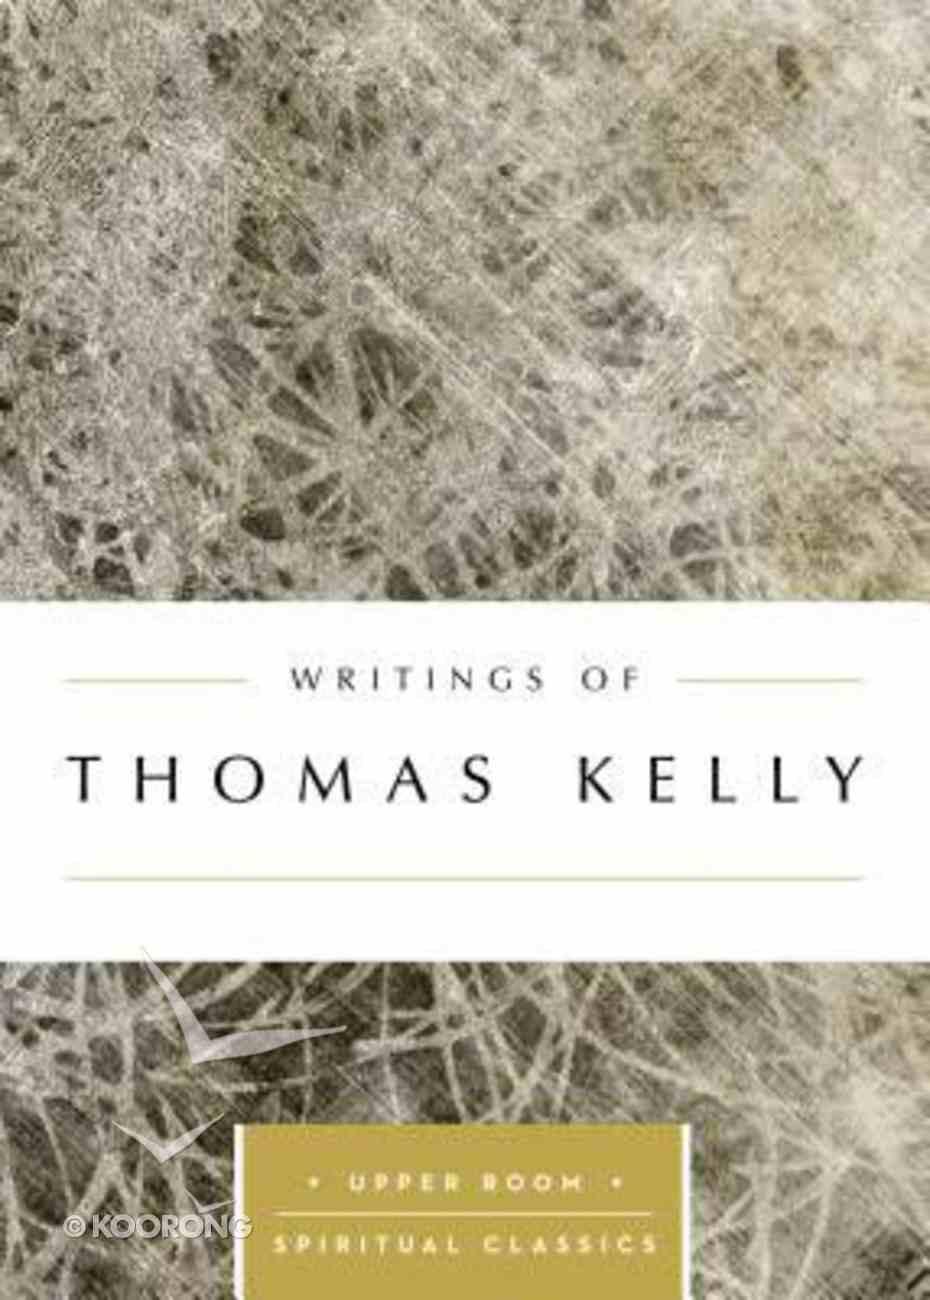 Writings of Thomas Kelly (Upper Room Spiritual Classics Series) Paperback